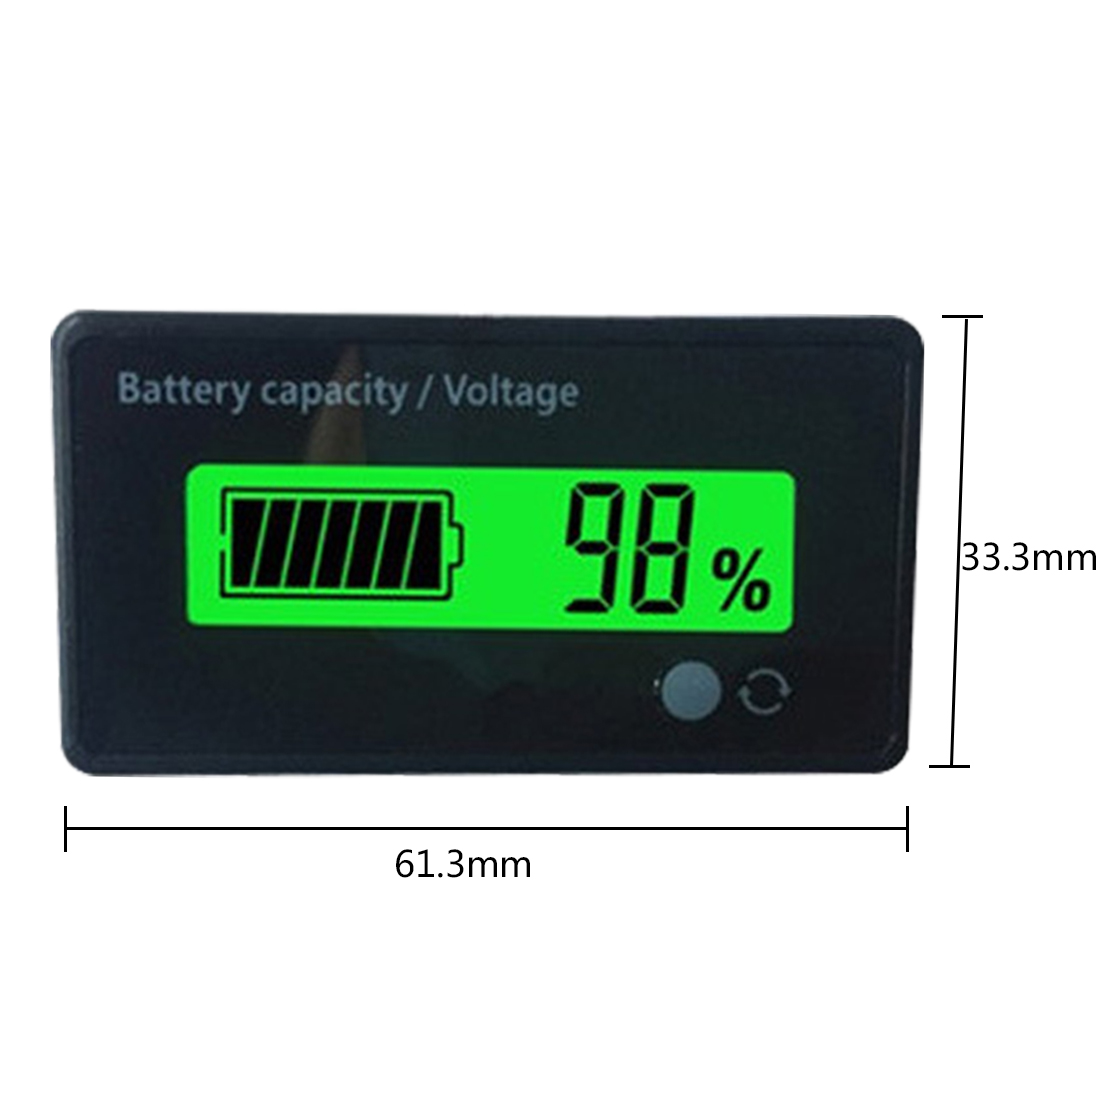 1pc Lithium Battery Capacity Indicator Voltage Tester Power Meter LCD Digital Voltmeter for 12V/24V/36V/48V Acid Lead battery capacity tester with lcd indicator for 12v 24v 30v lead acid lithium lipo